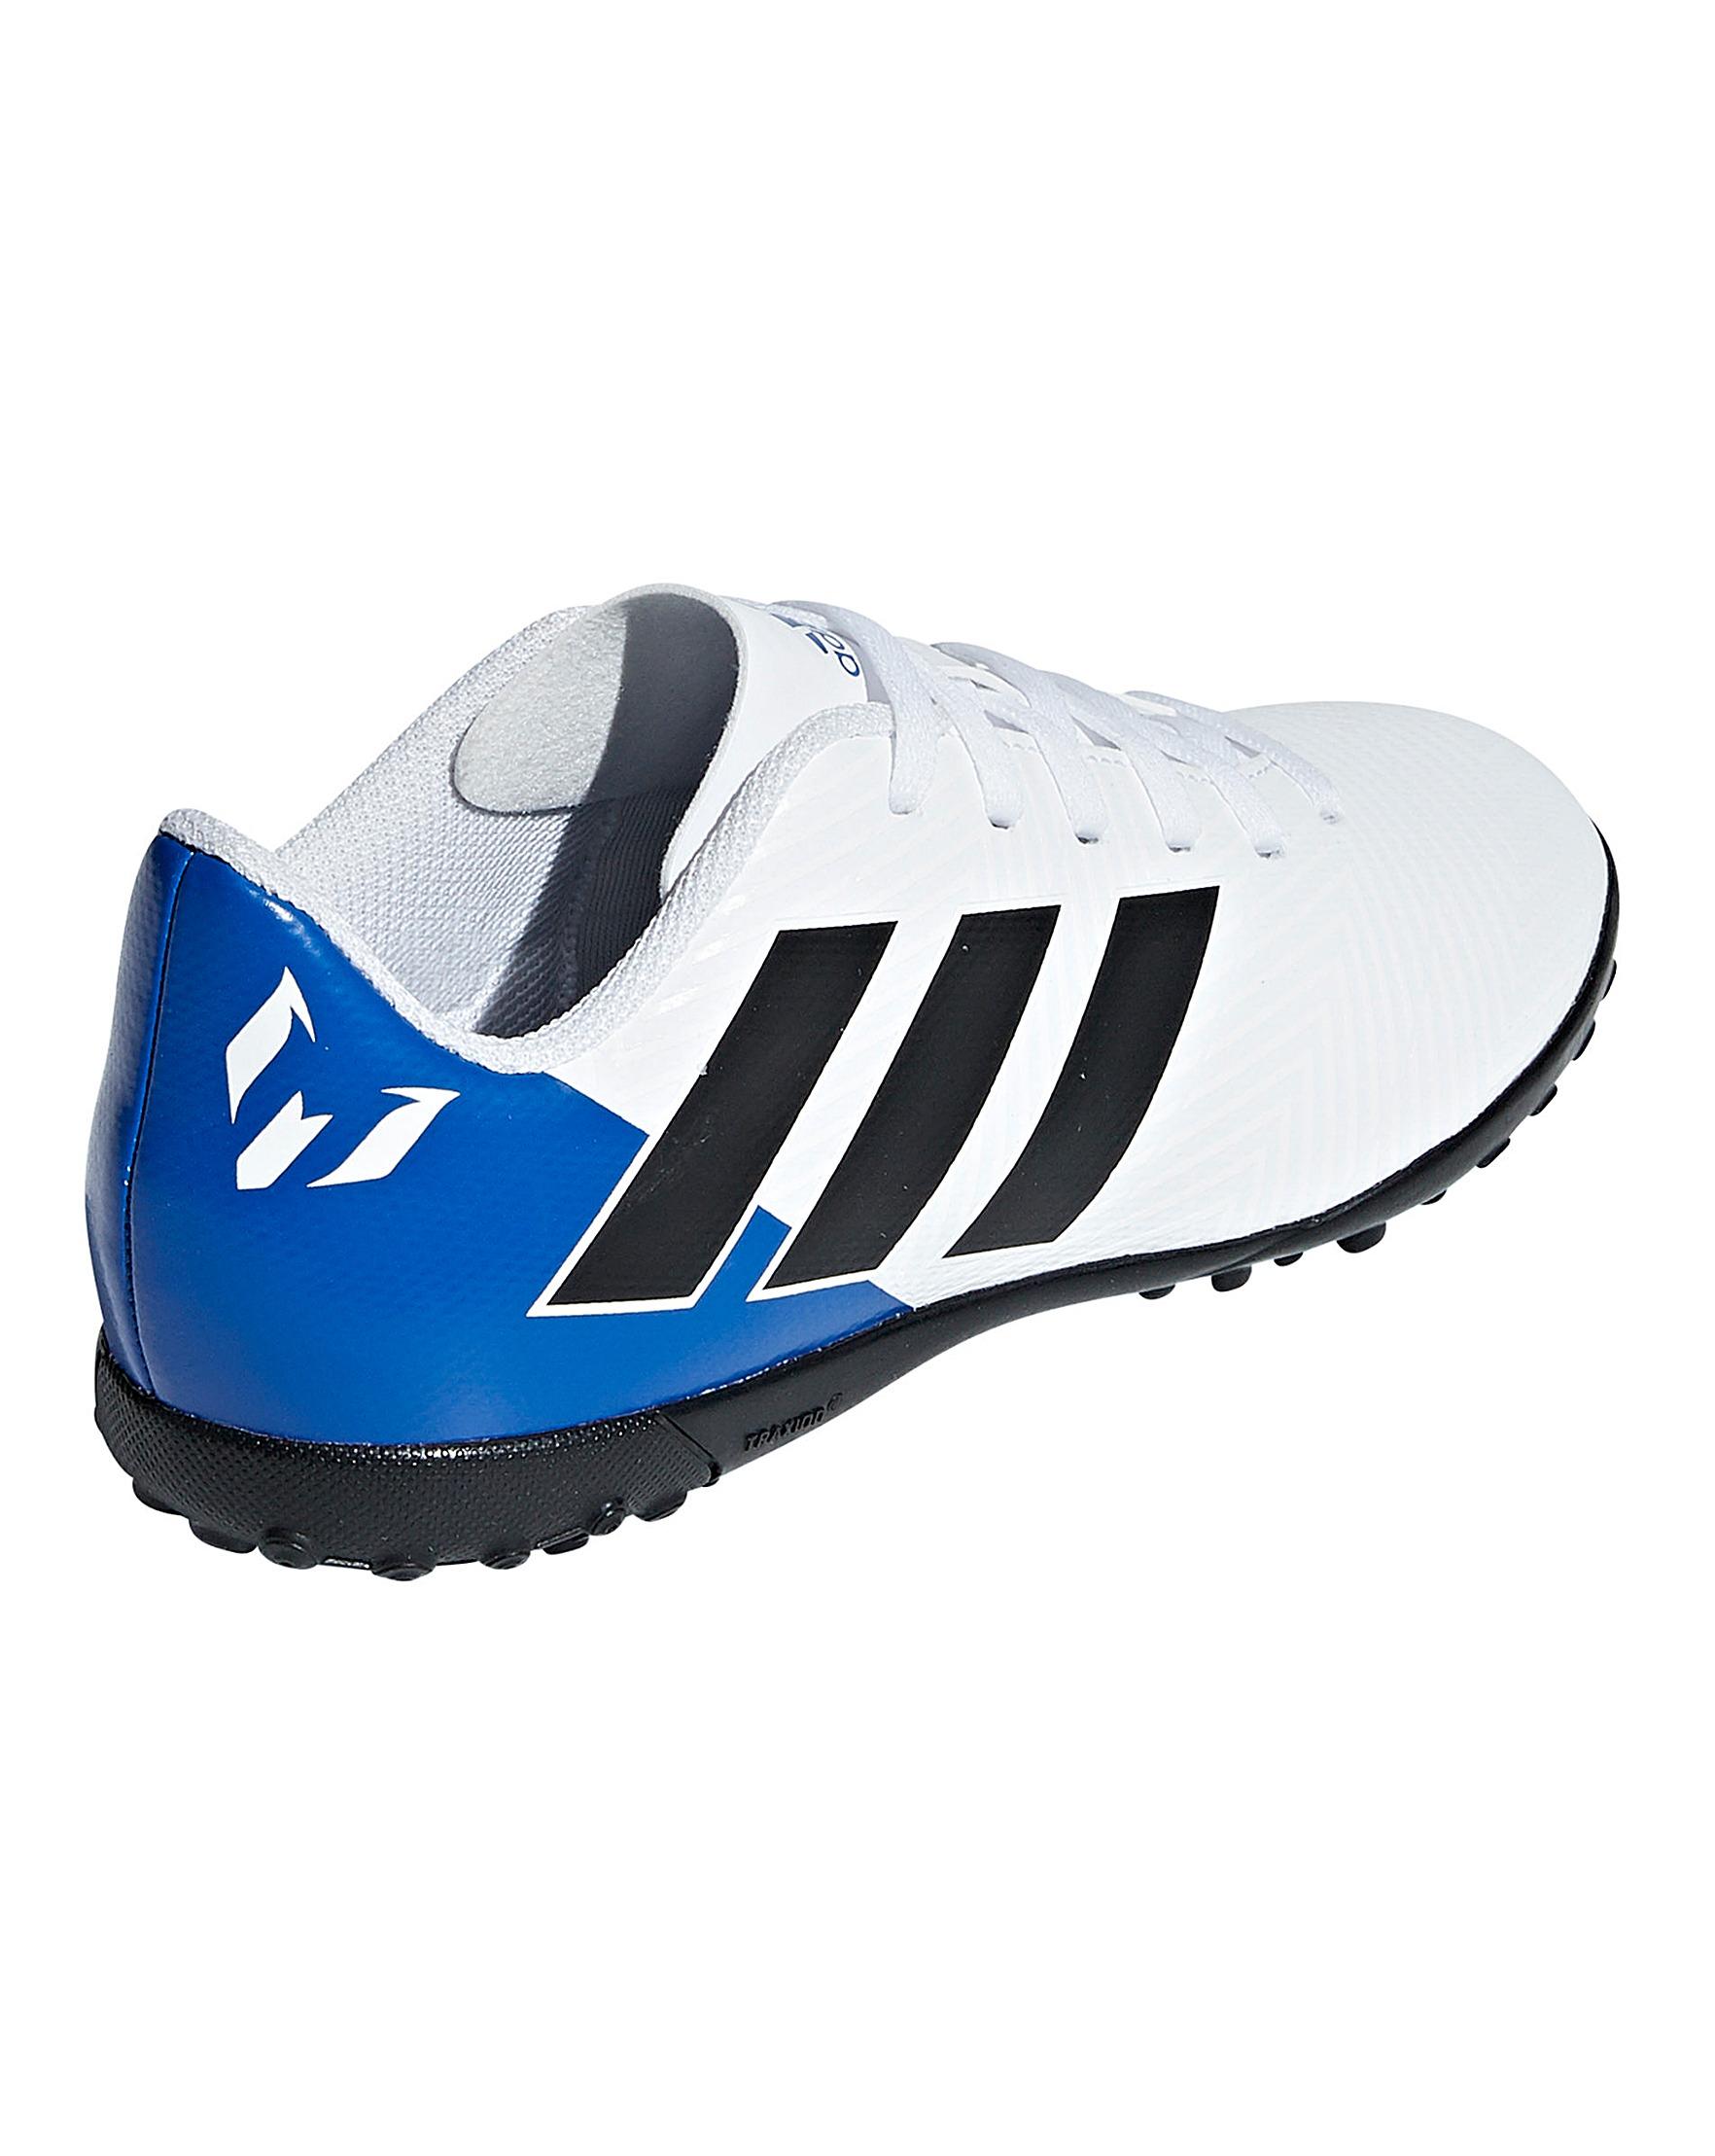 ea9a585d64ac adidas Nemeziz Messi Tango 18.4 TF Boots